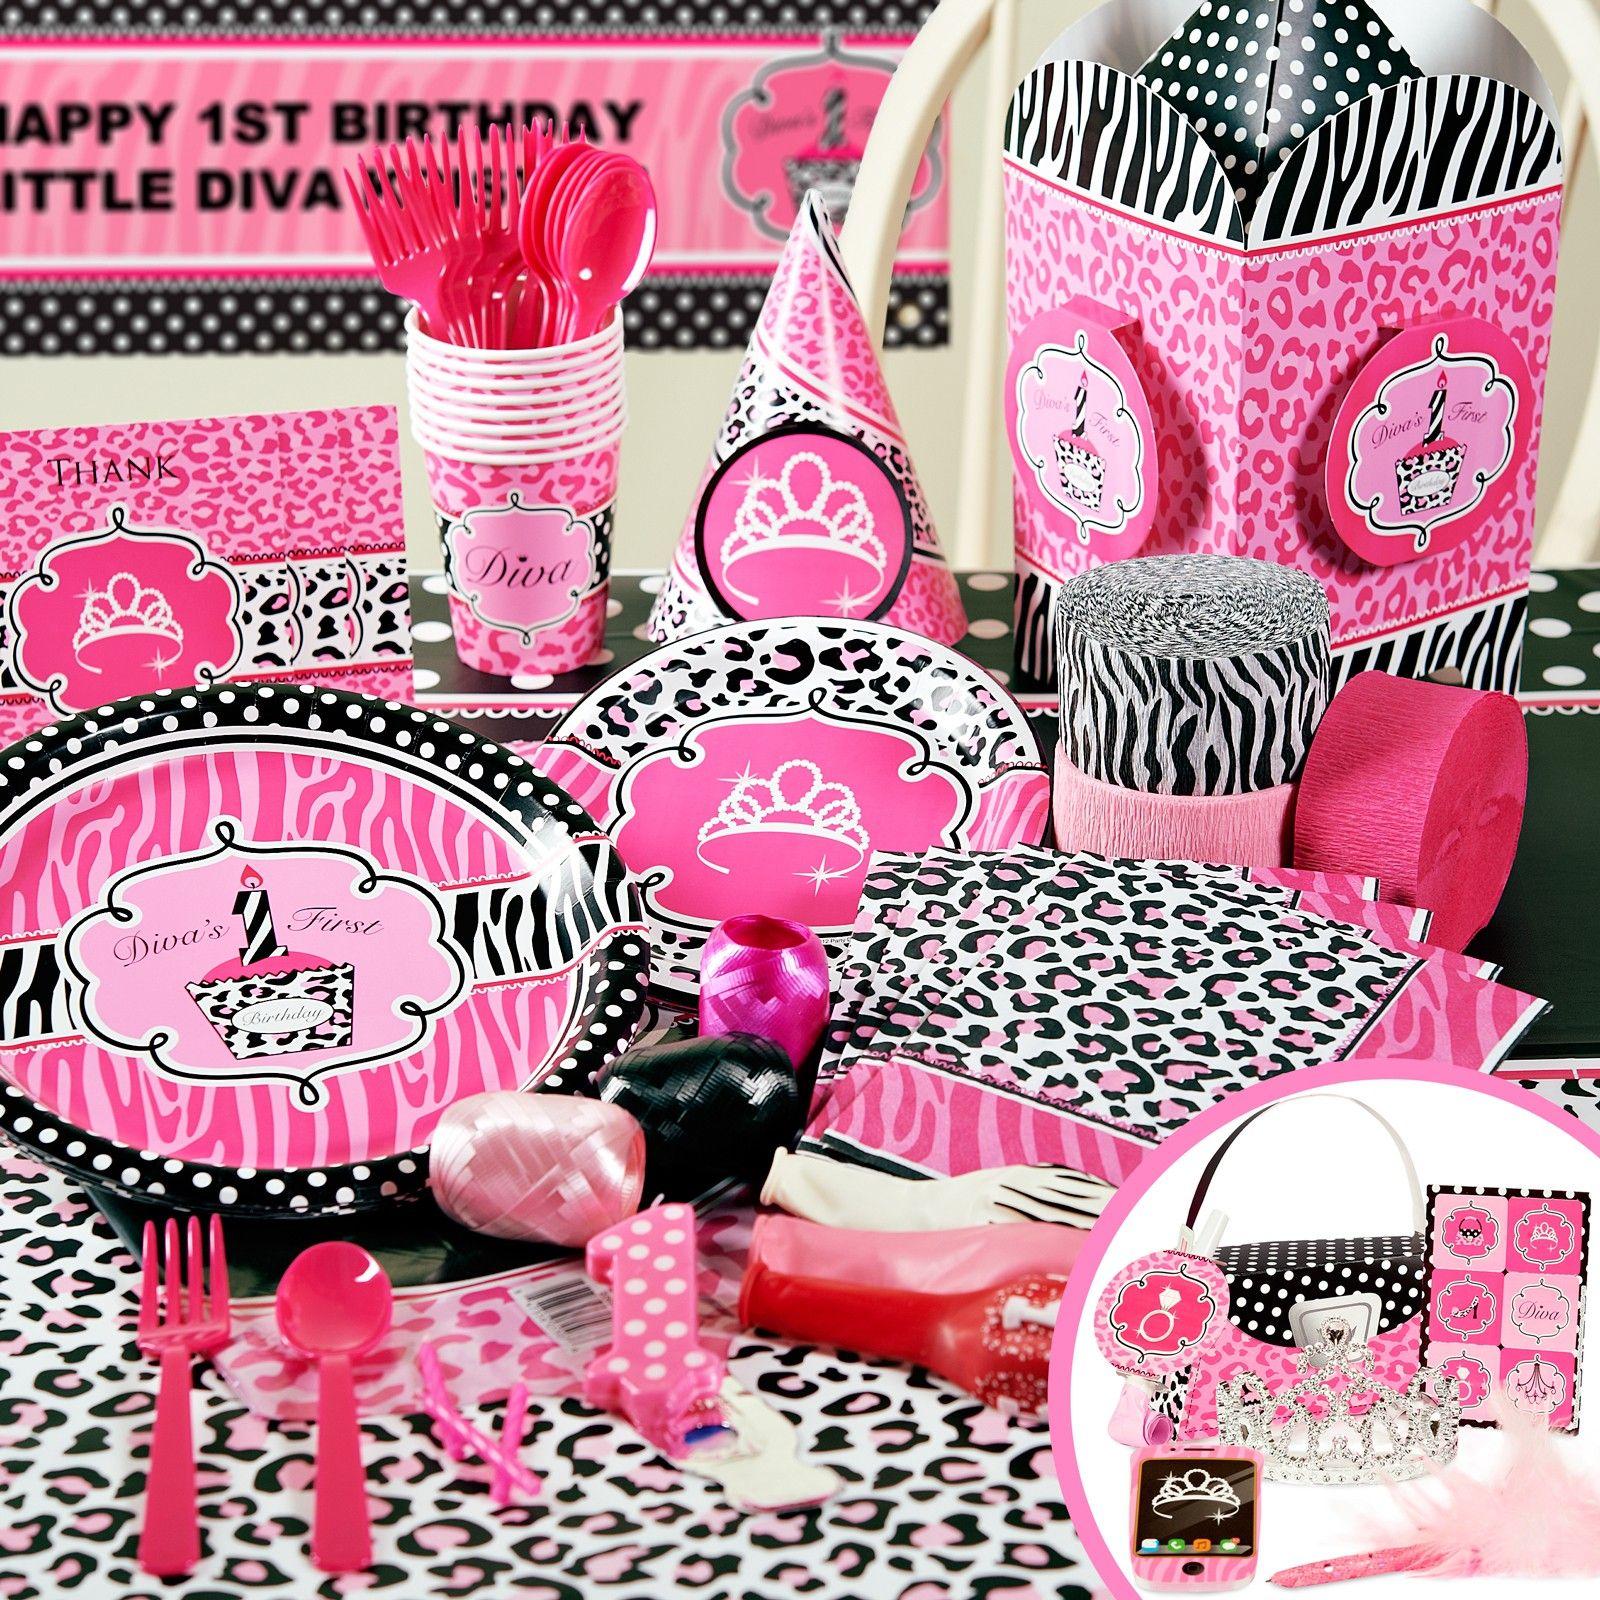 Diva Zebra Print 1st Birthday Party Packs 86382 Party ideas